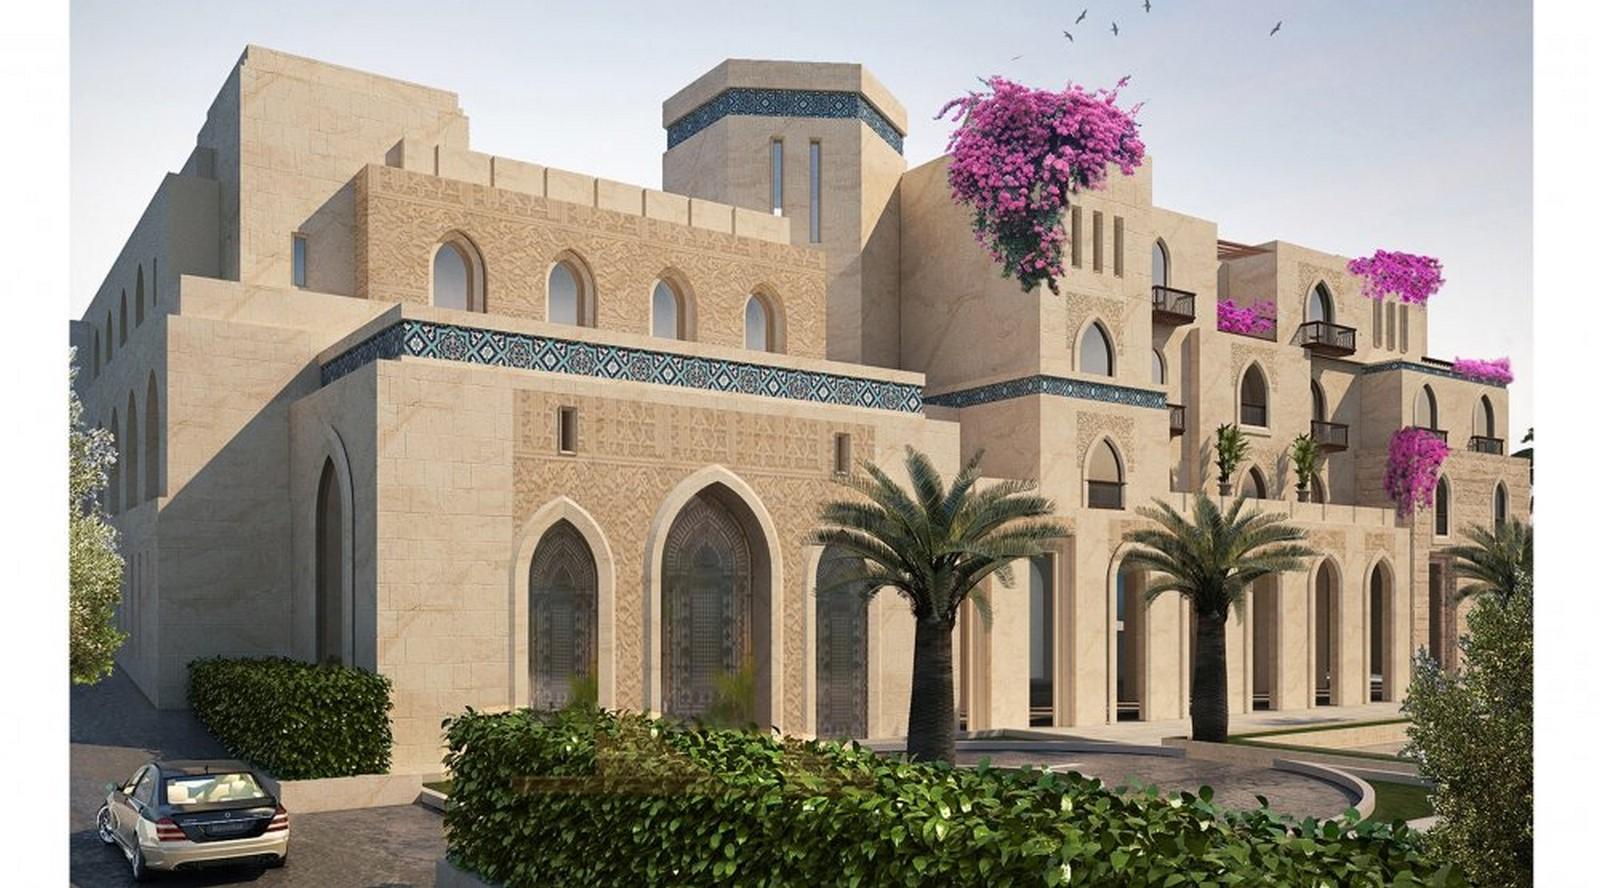 Öney Architecture- 15 Iconic Projects